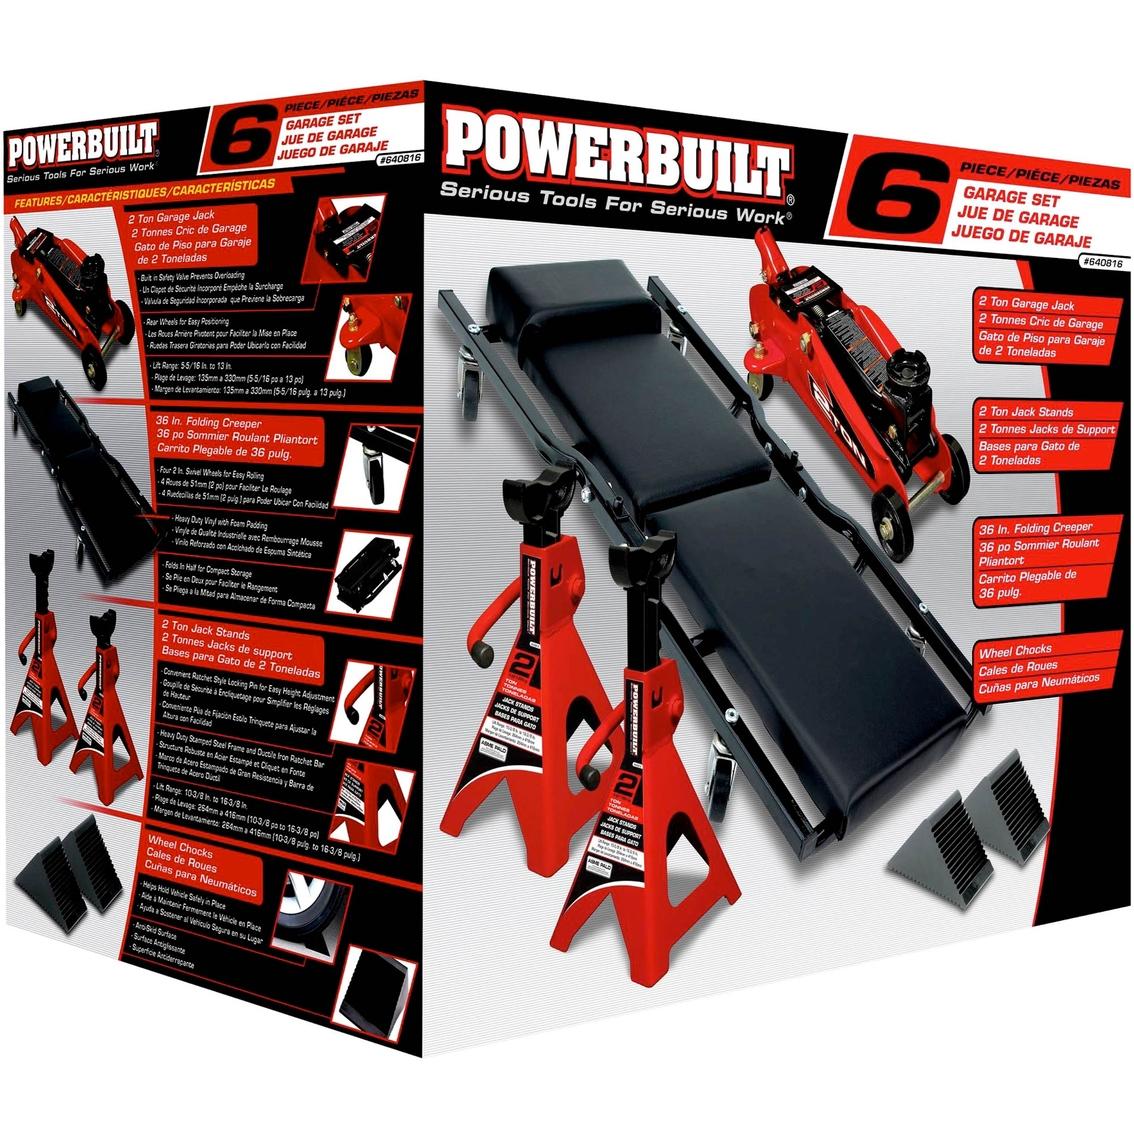 Powerbuilt 6 Pc Garage Tire Change Service Kit Emergency Road